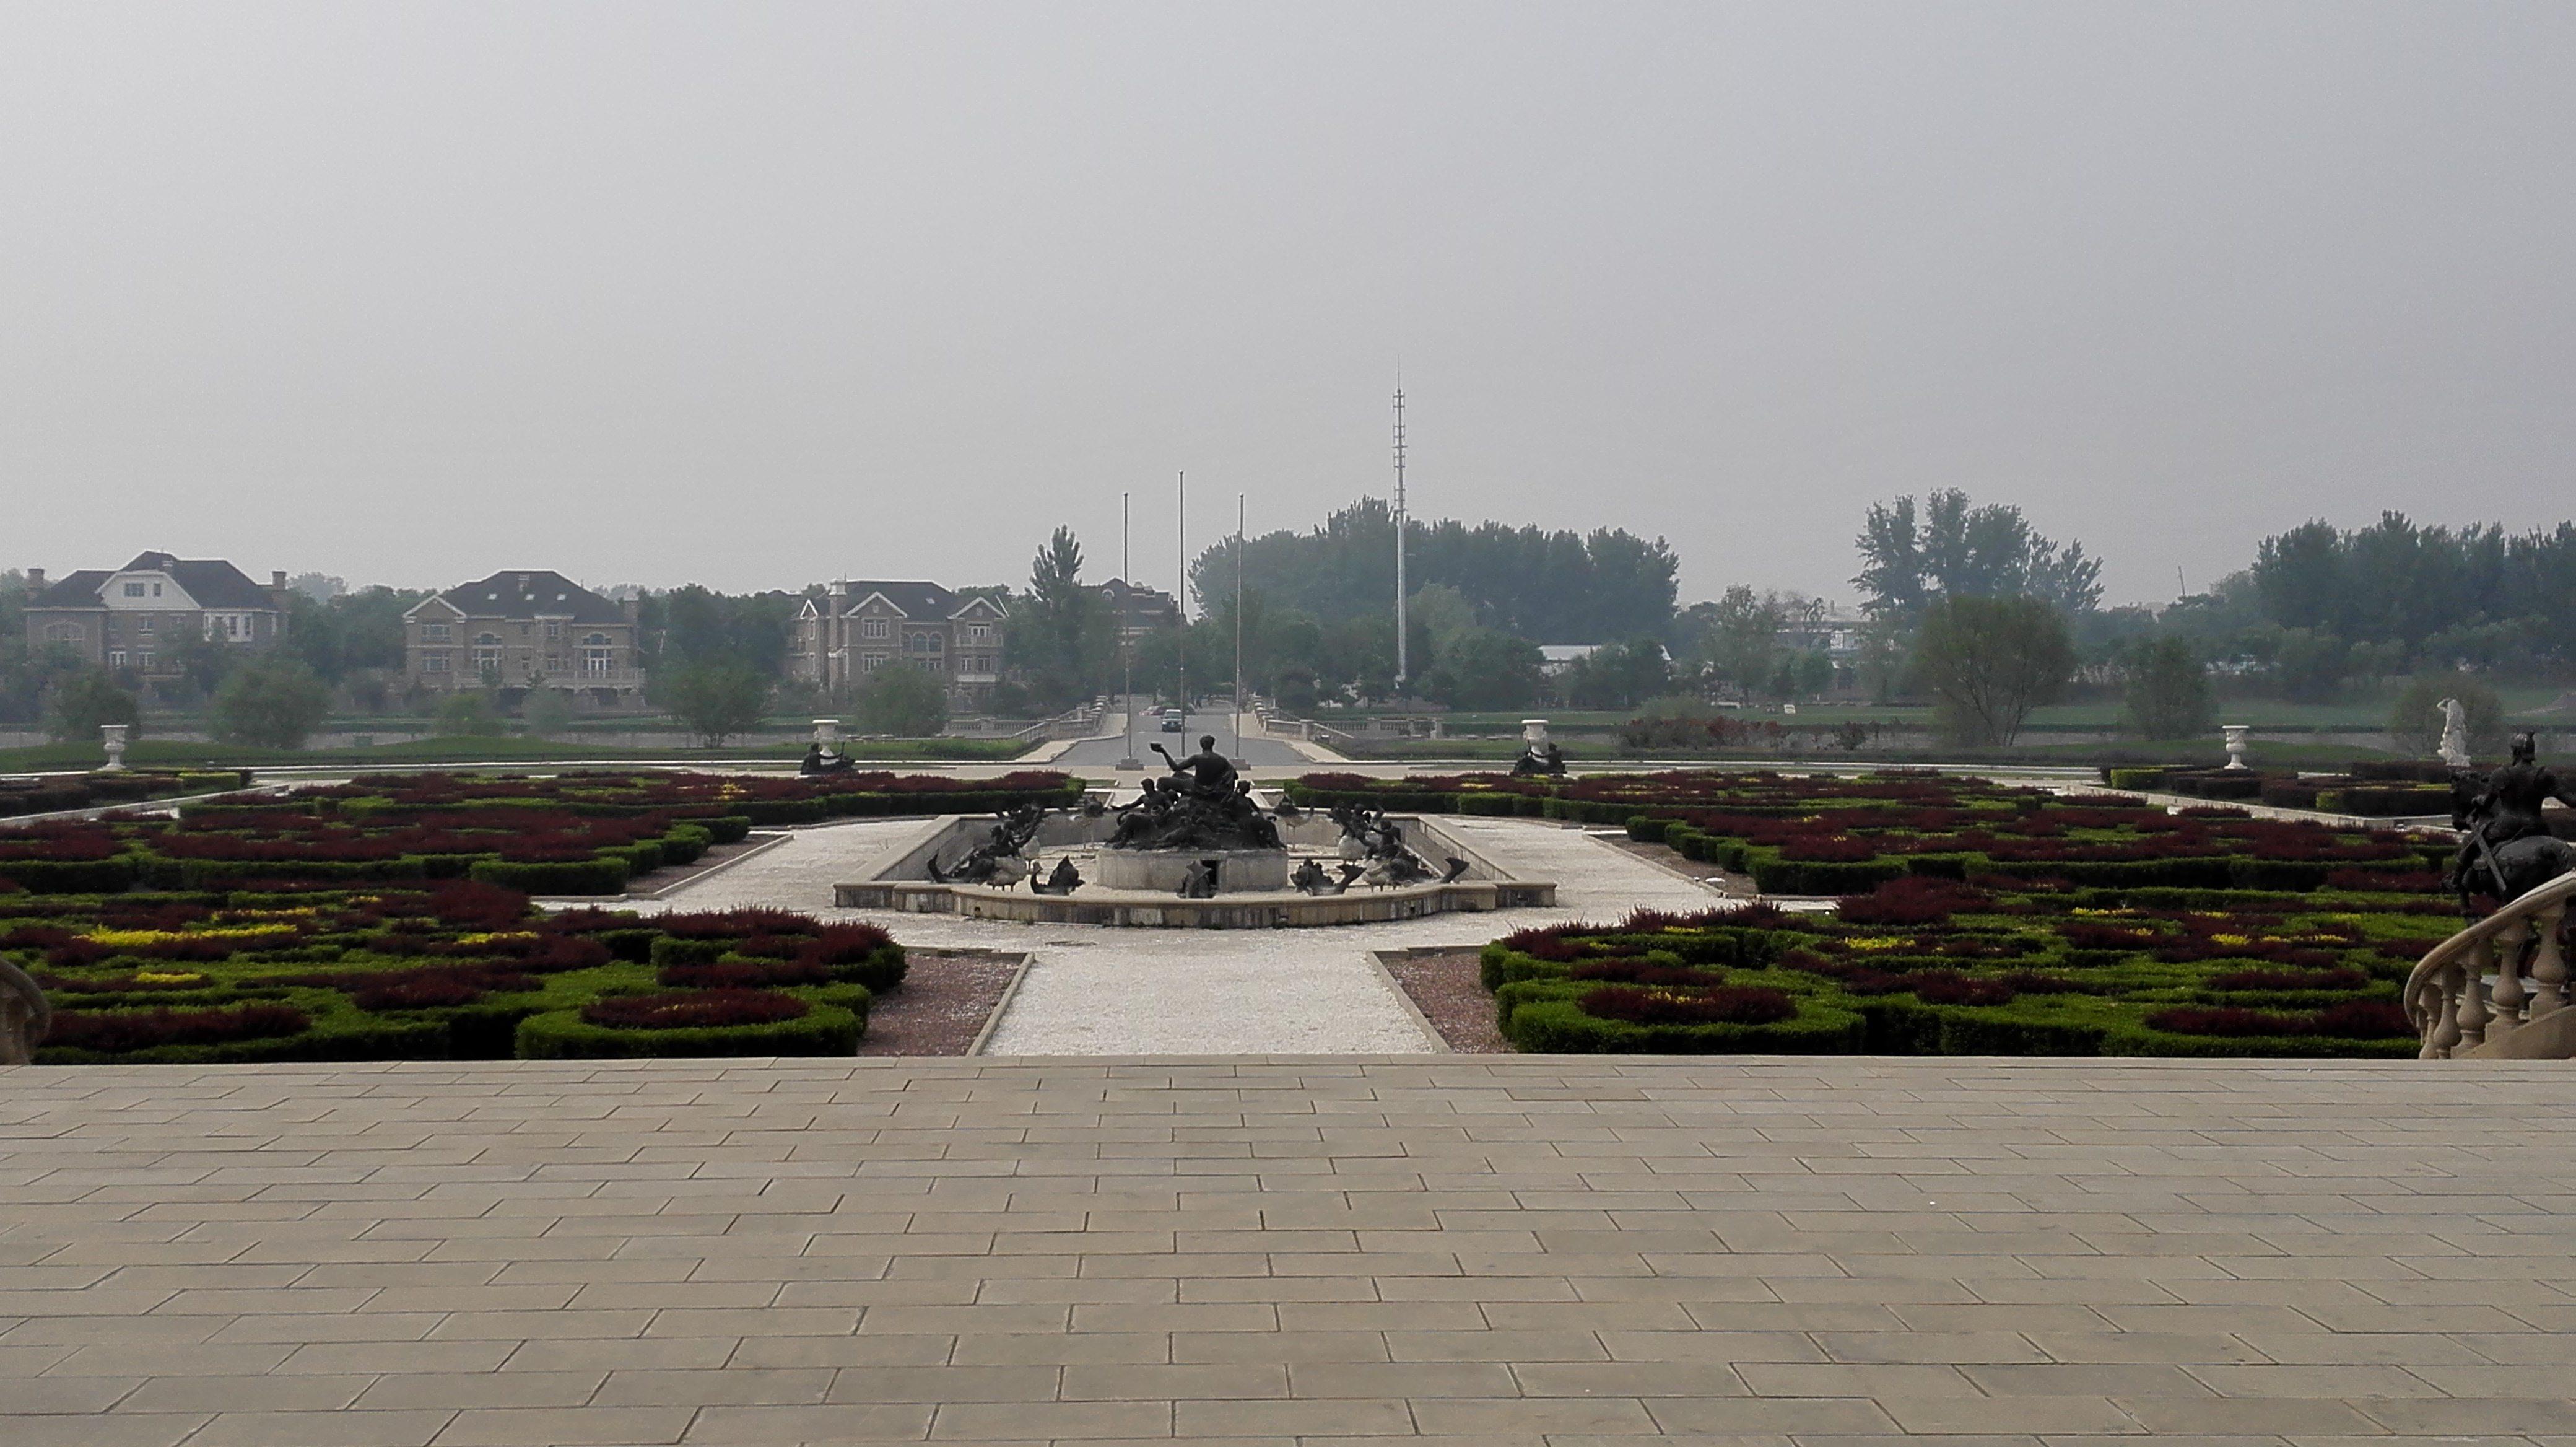 Beijing Chateau Laffitte Hotel (Einviroment)